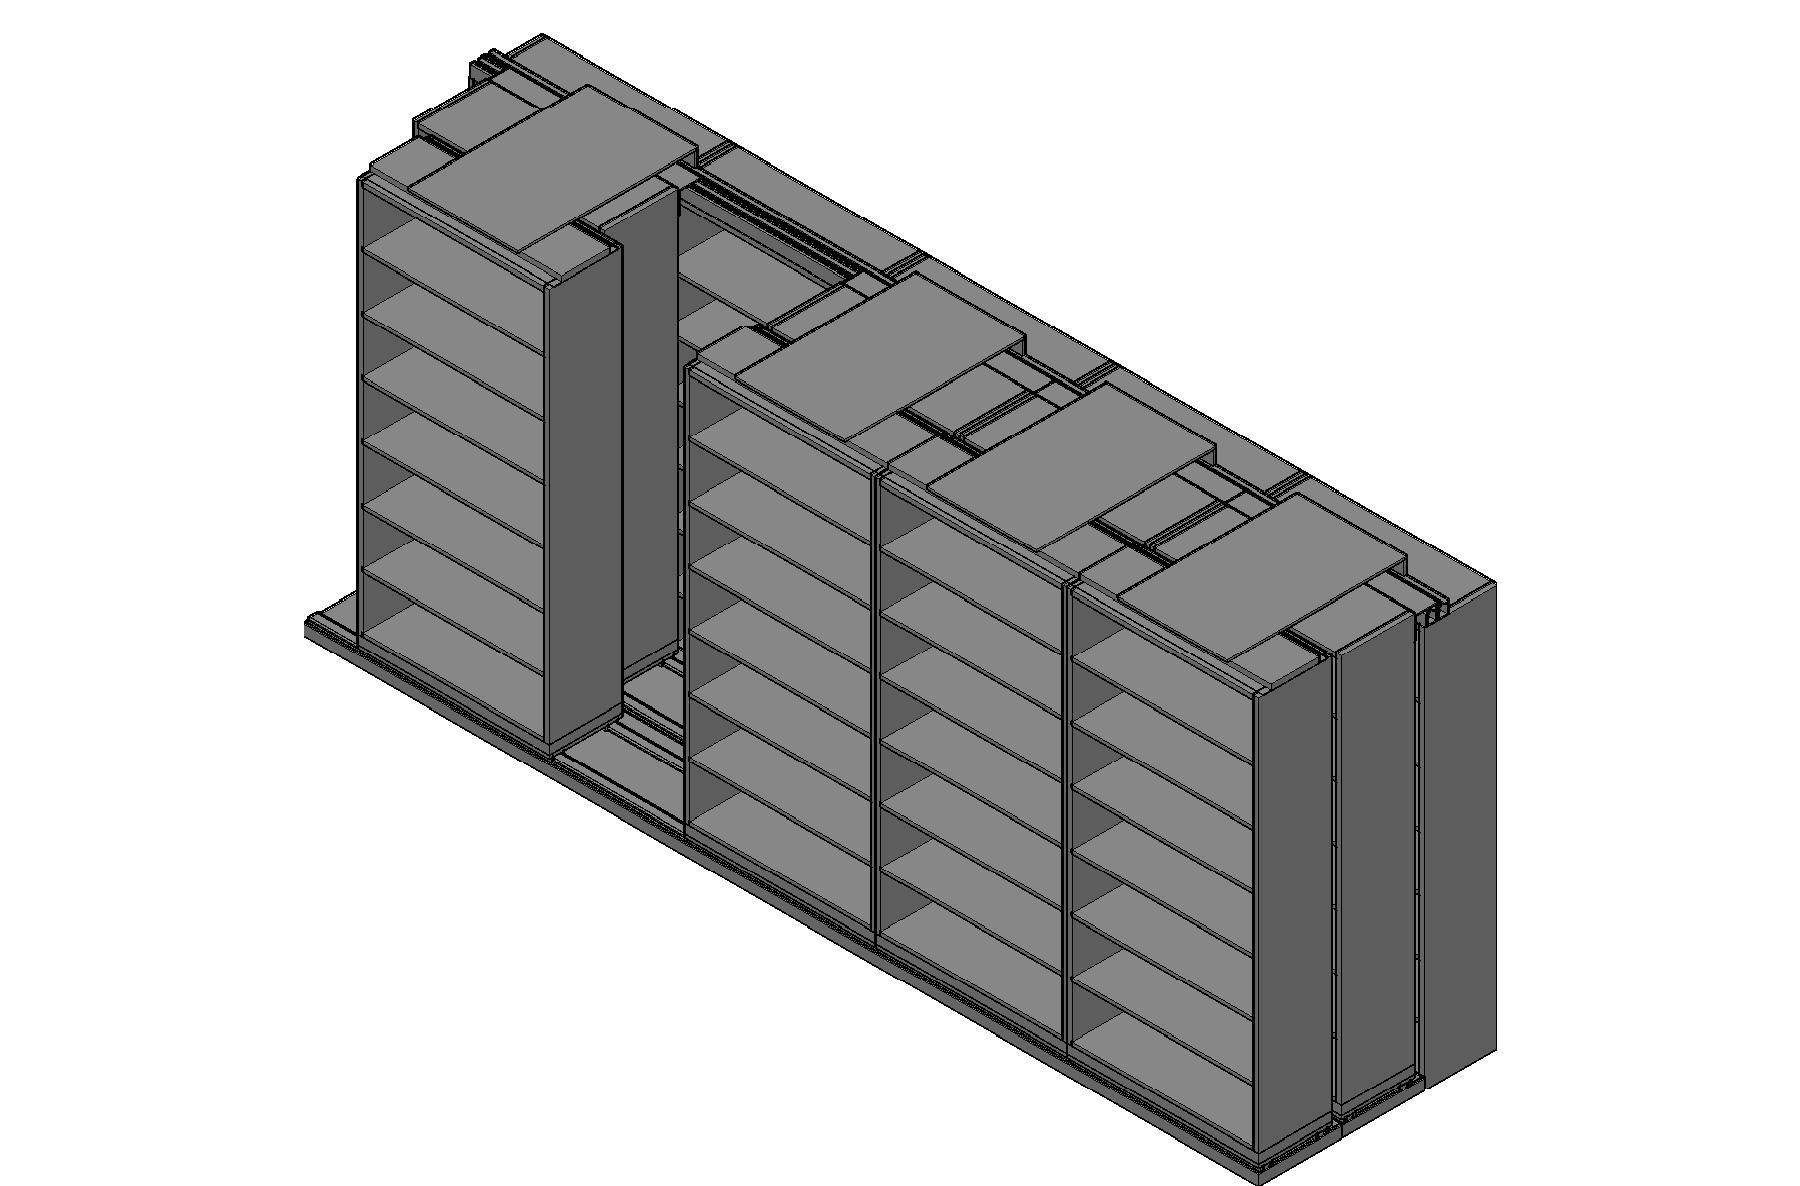 "Box Size Sliding Shelves - 3 Rows Deep - 7 Levels - (42"" x 16"" Shelves) - 214"" Total Width"